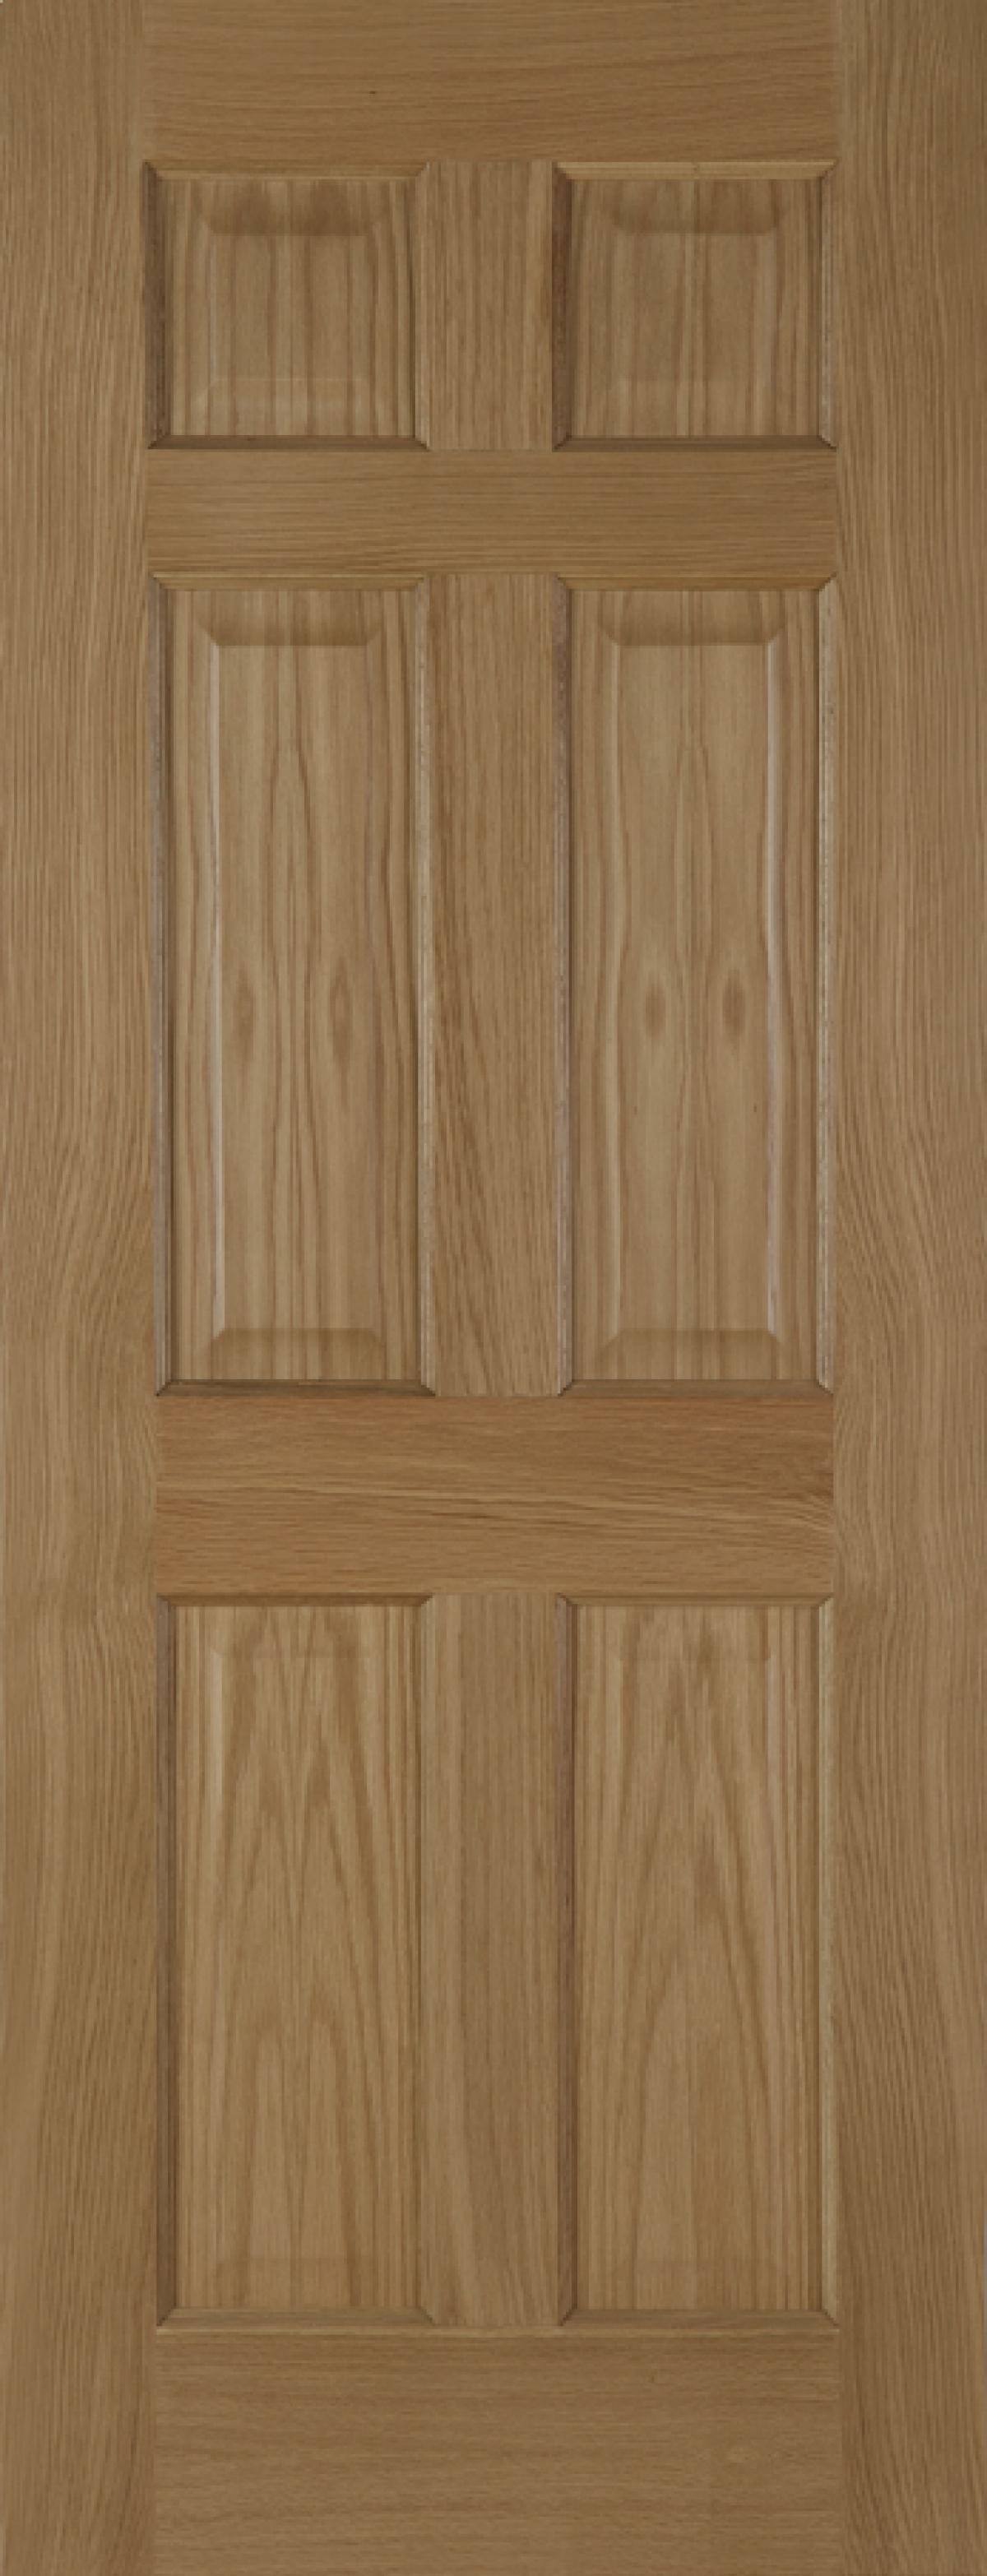 Oak 6 Panel